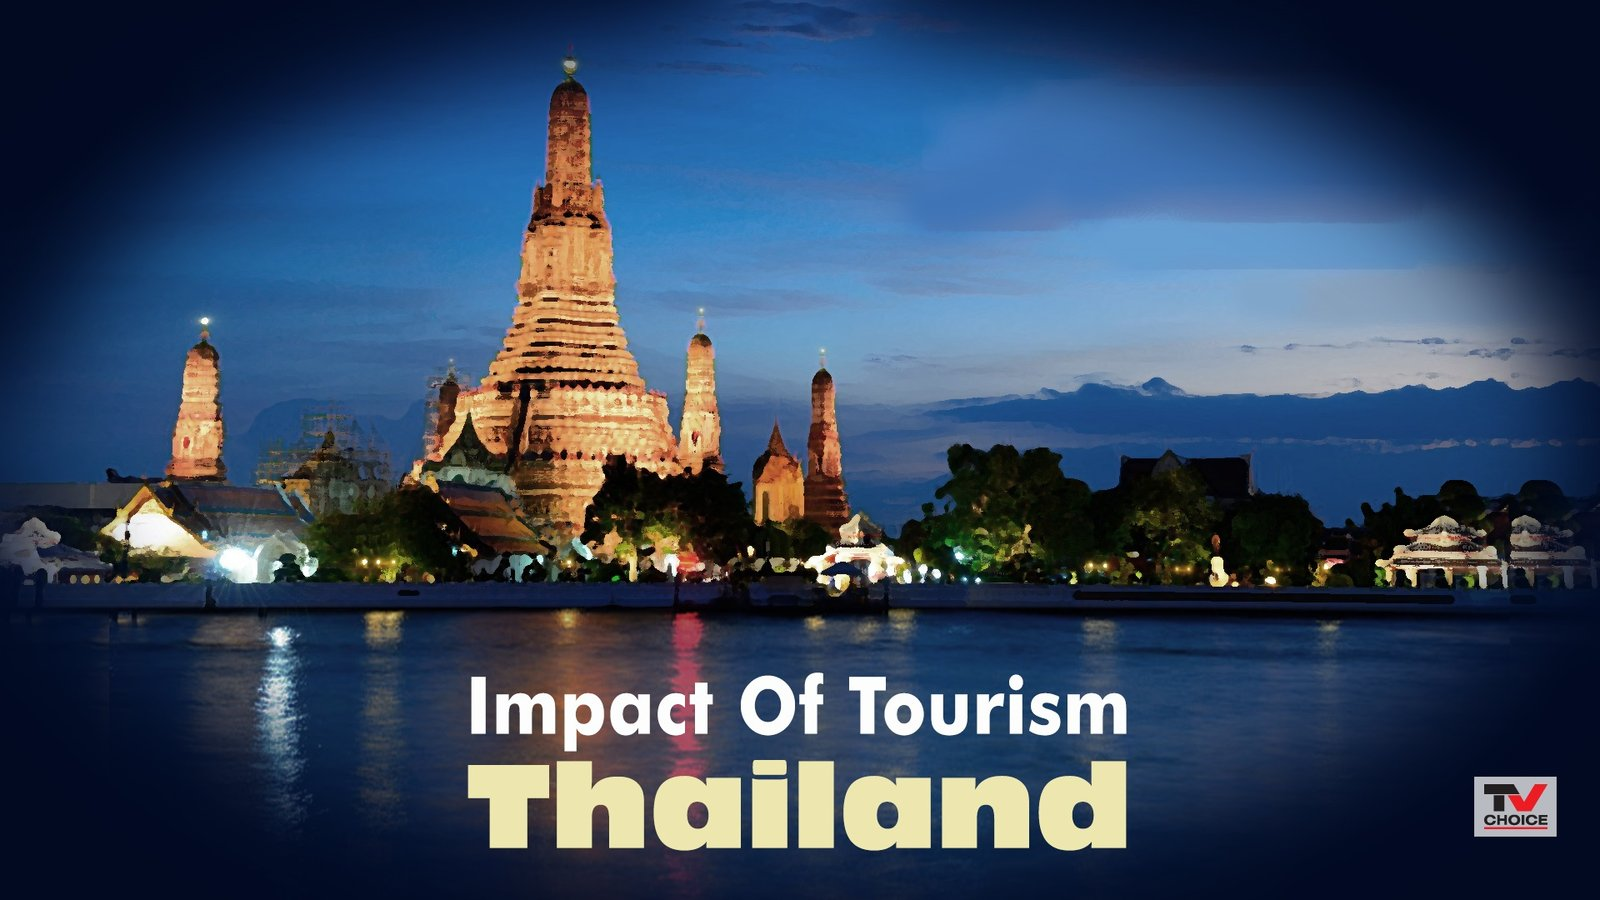 Impact of Tourism: Thailand